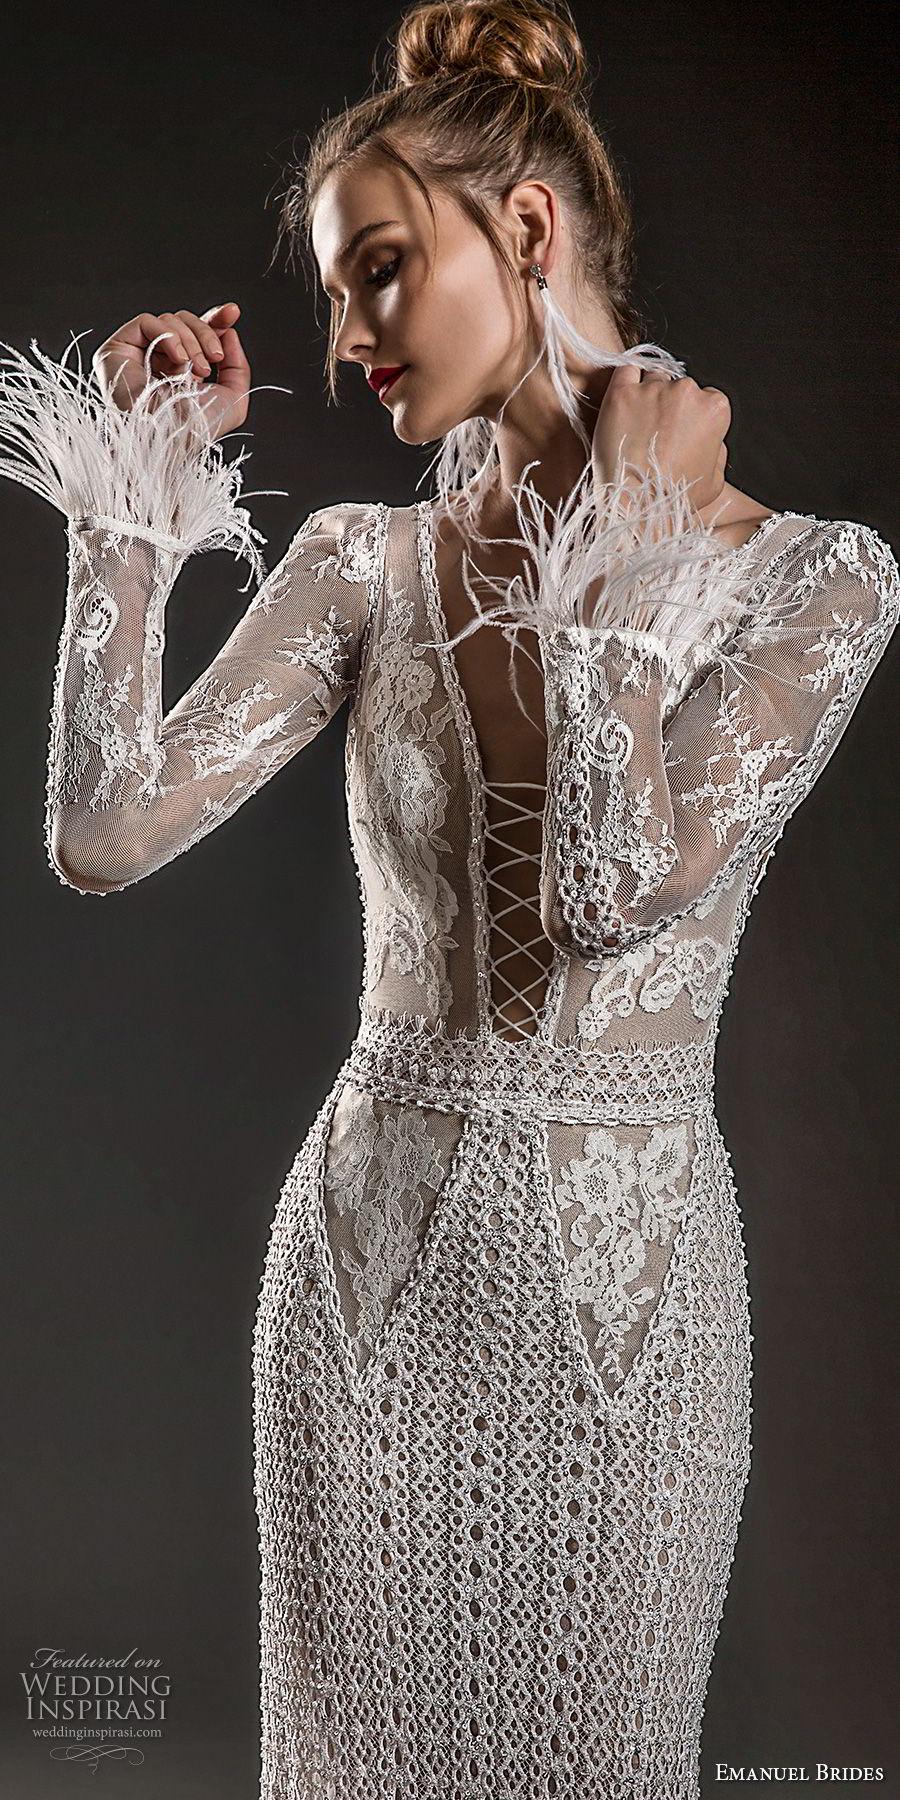 emanuel brides 2018 bridal long sleeves deep plunging v neck full embellishment elegant sexy glamorous sheath wedding dress open v back sweep train (07) zv